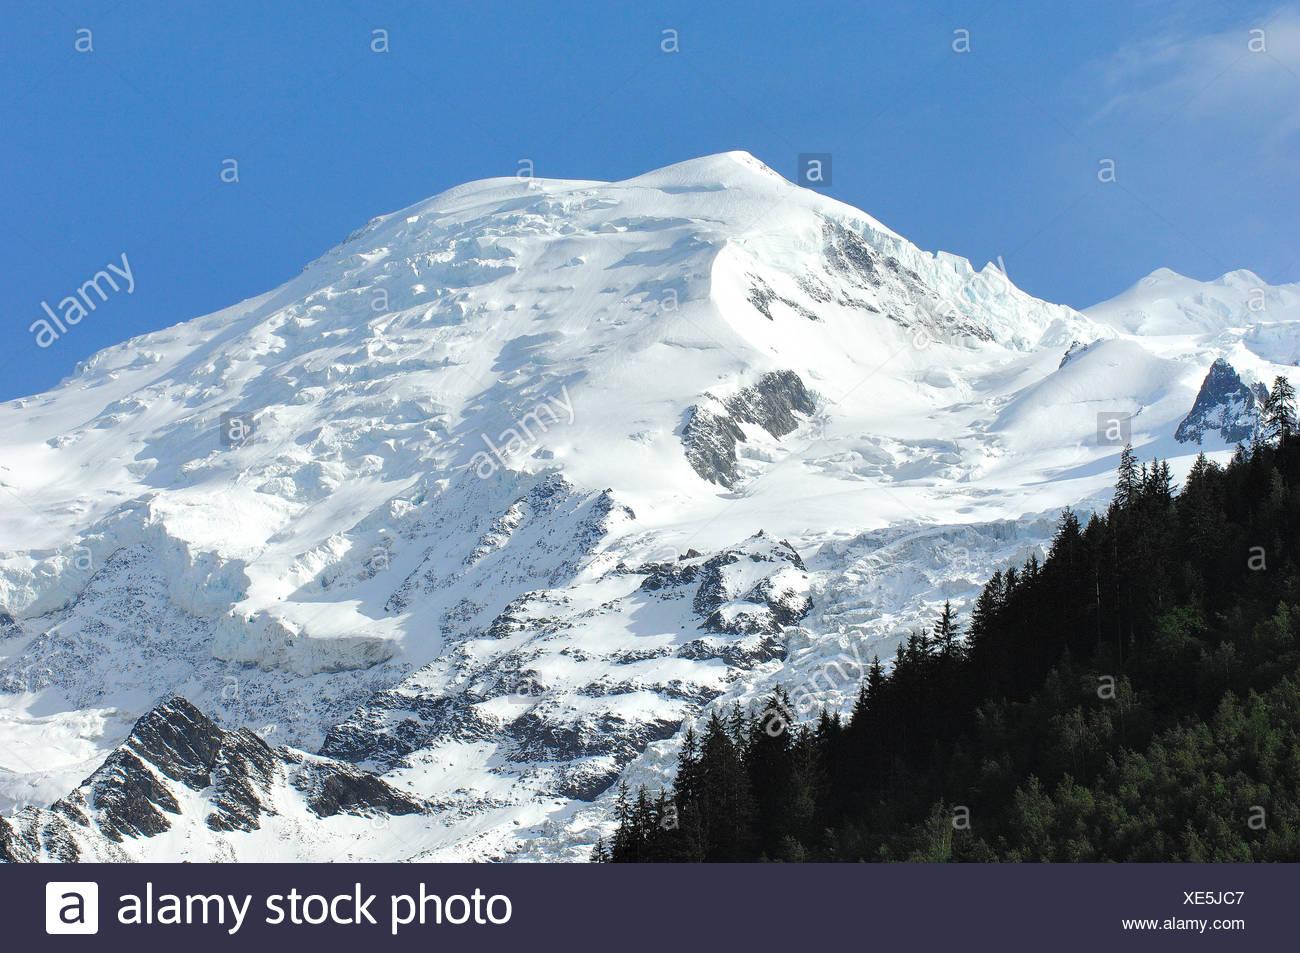 europe france europe france montblanc chamonix rhne-alpes haute-savoie - Stock Image